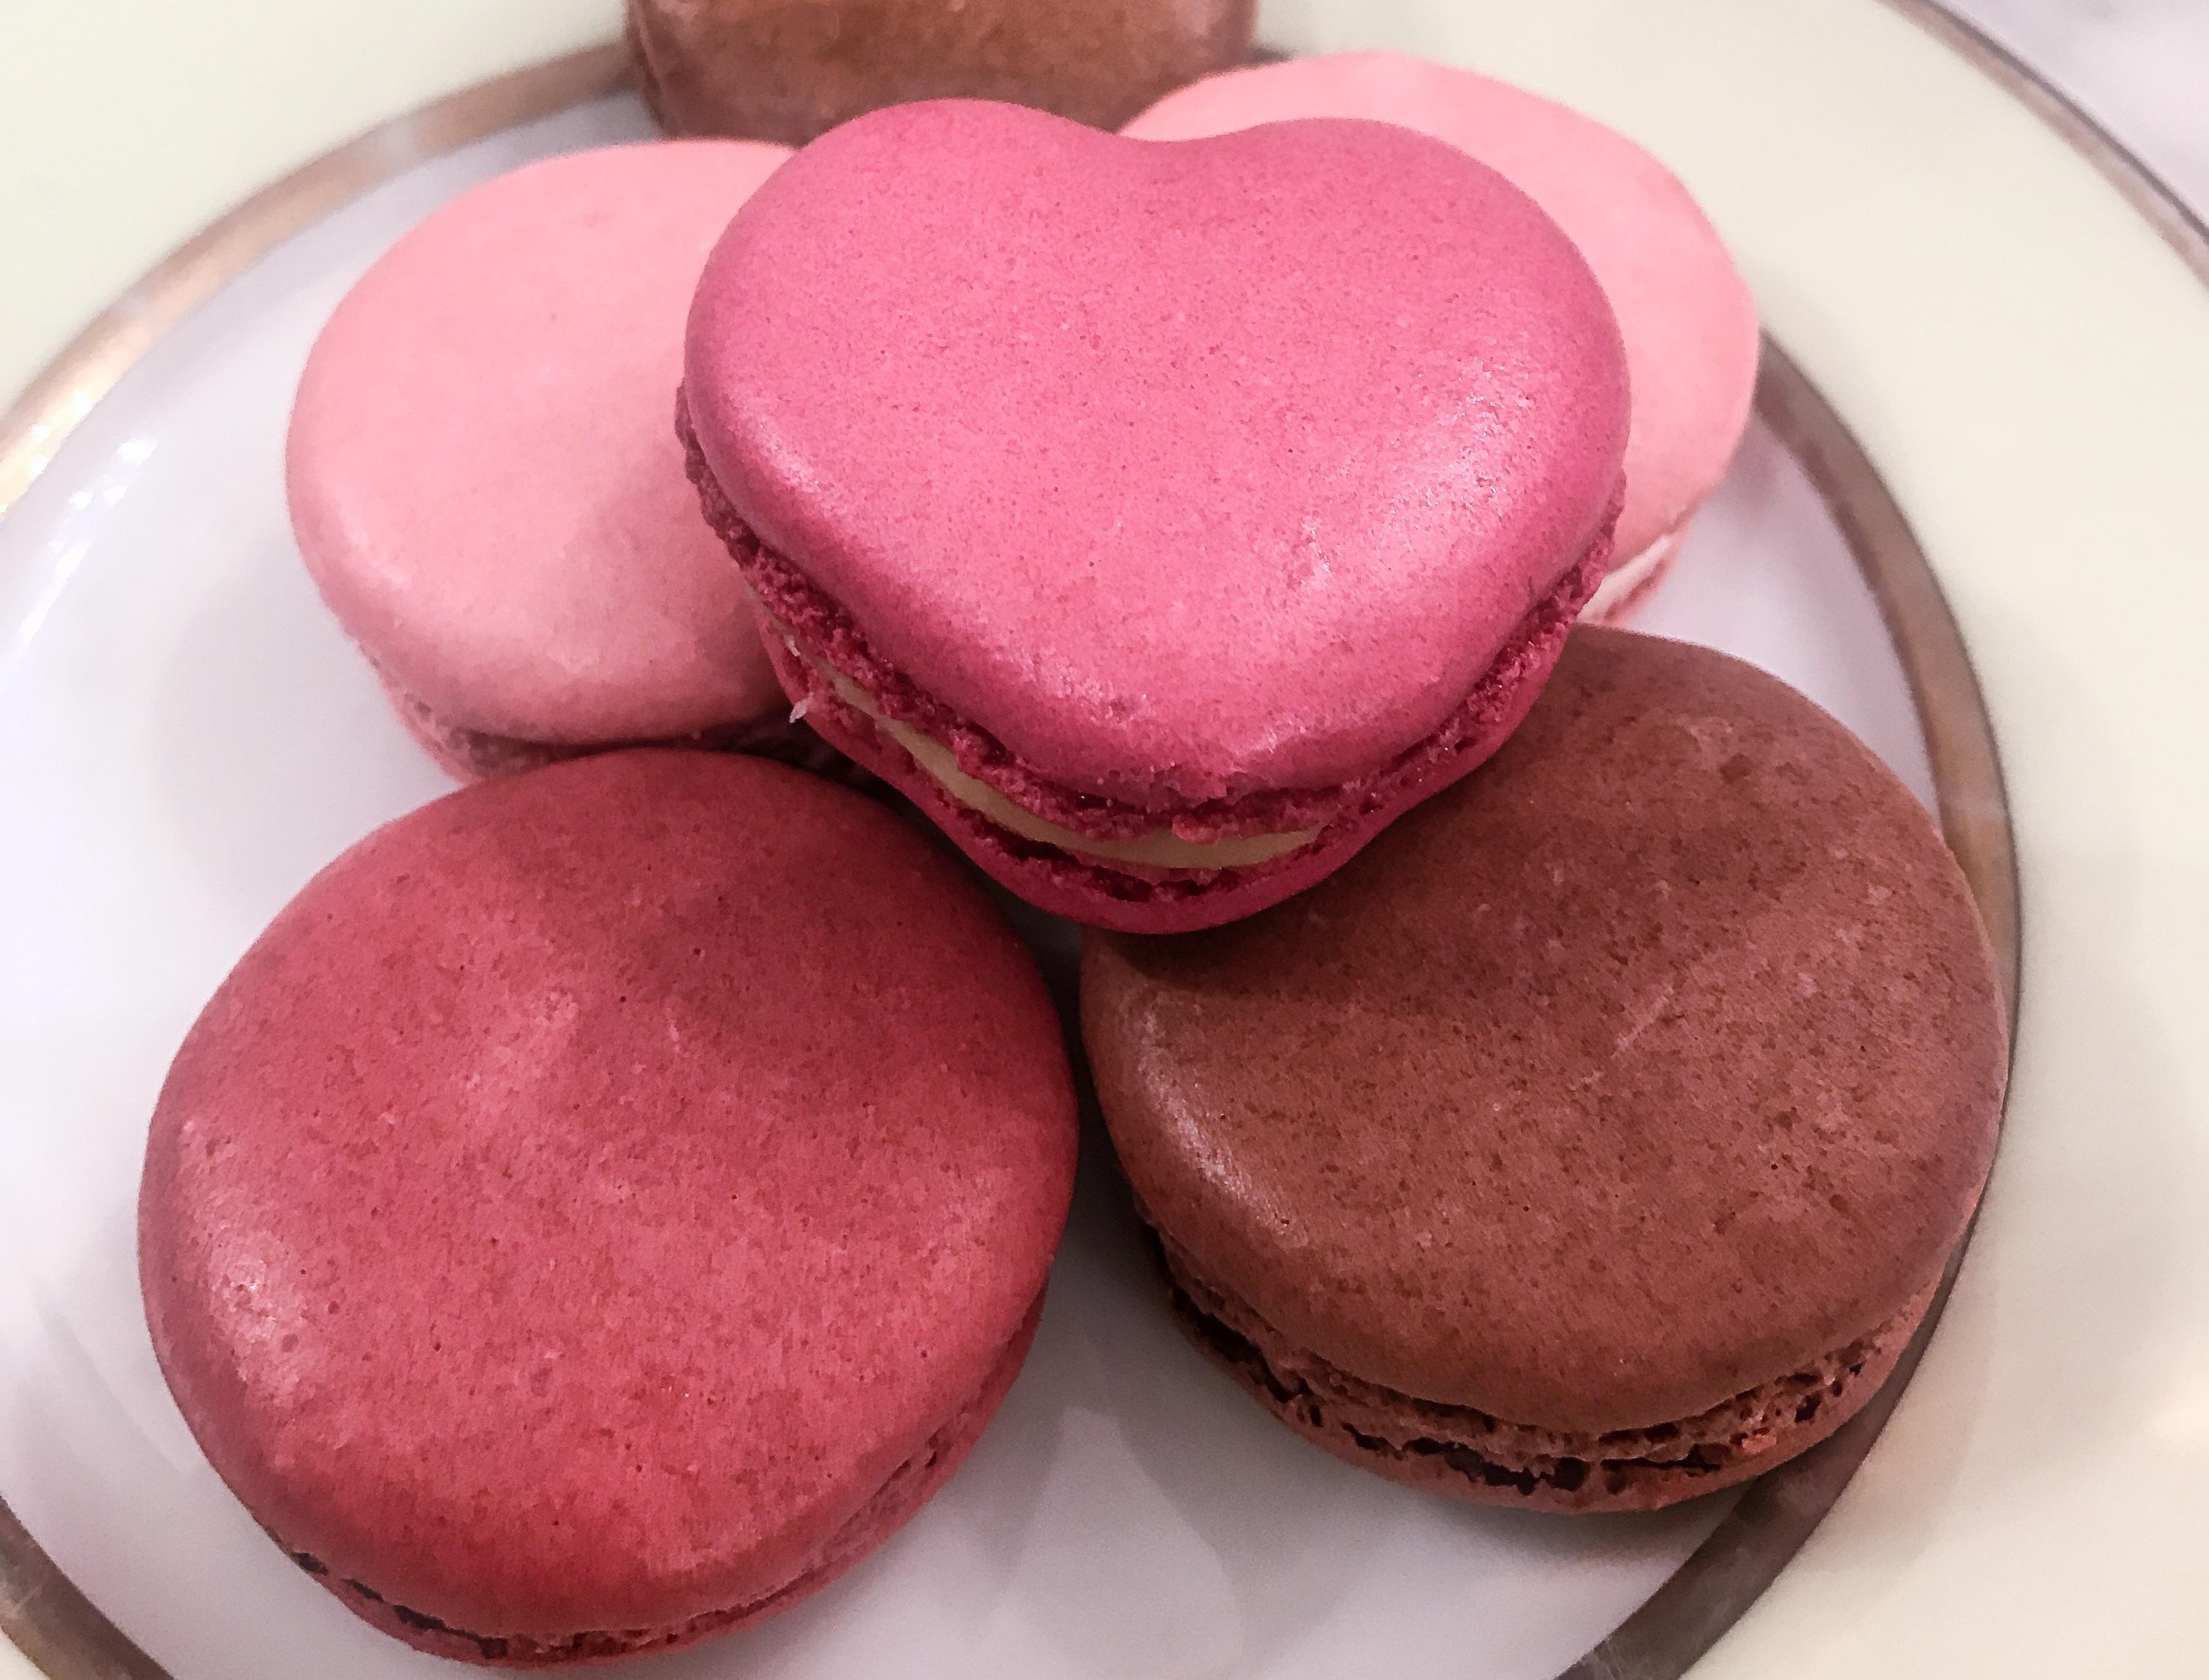 Gambar Jantung Warna Warni Warna Berwarna Merah Muda Cokelat